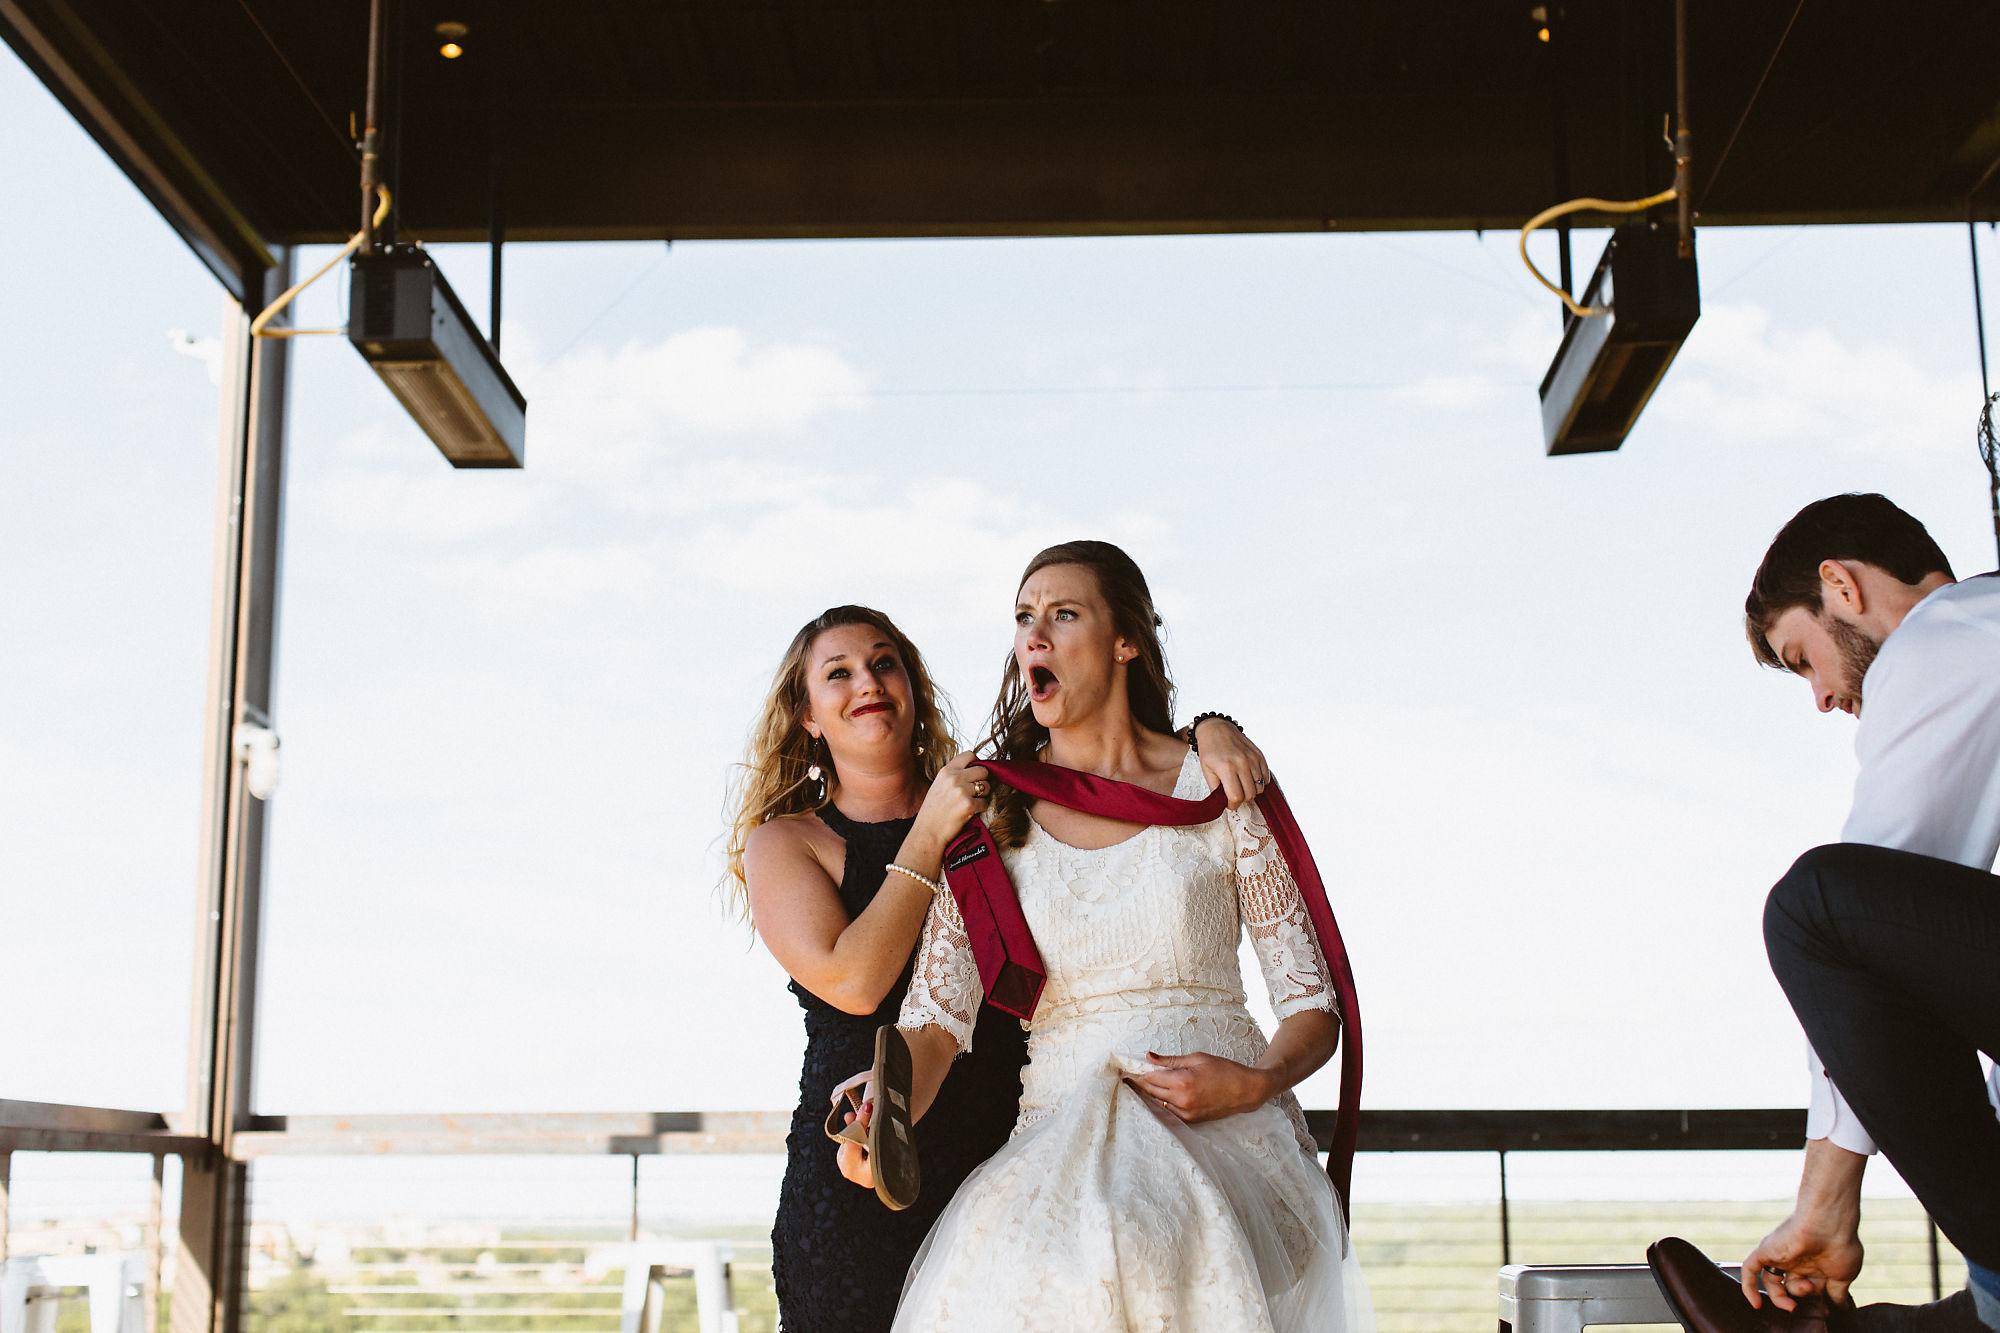 jessica_austin_oasis_brewery_wedding_photos161507.jpg